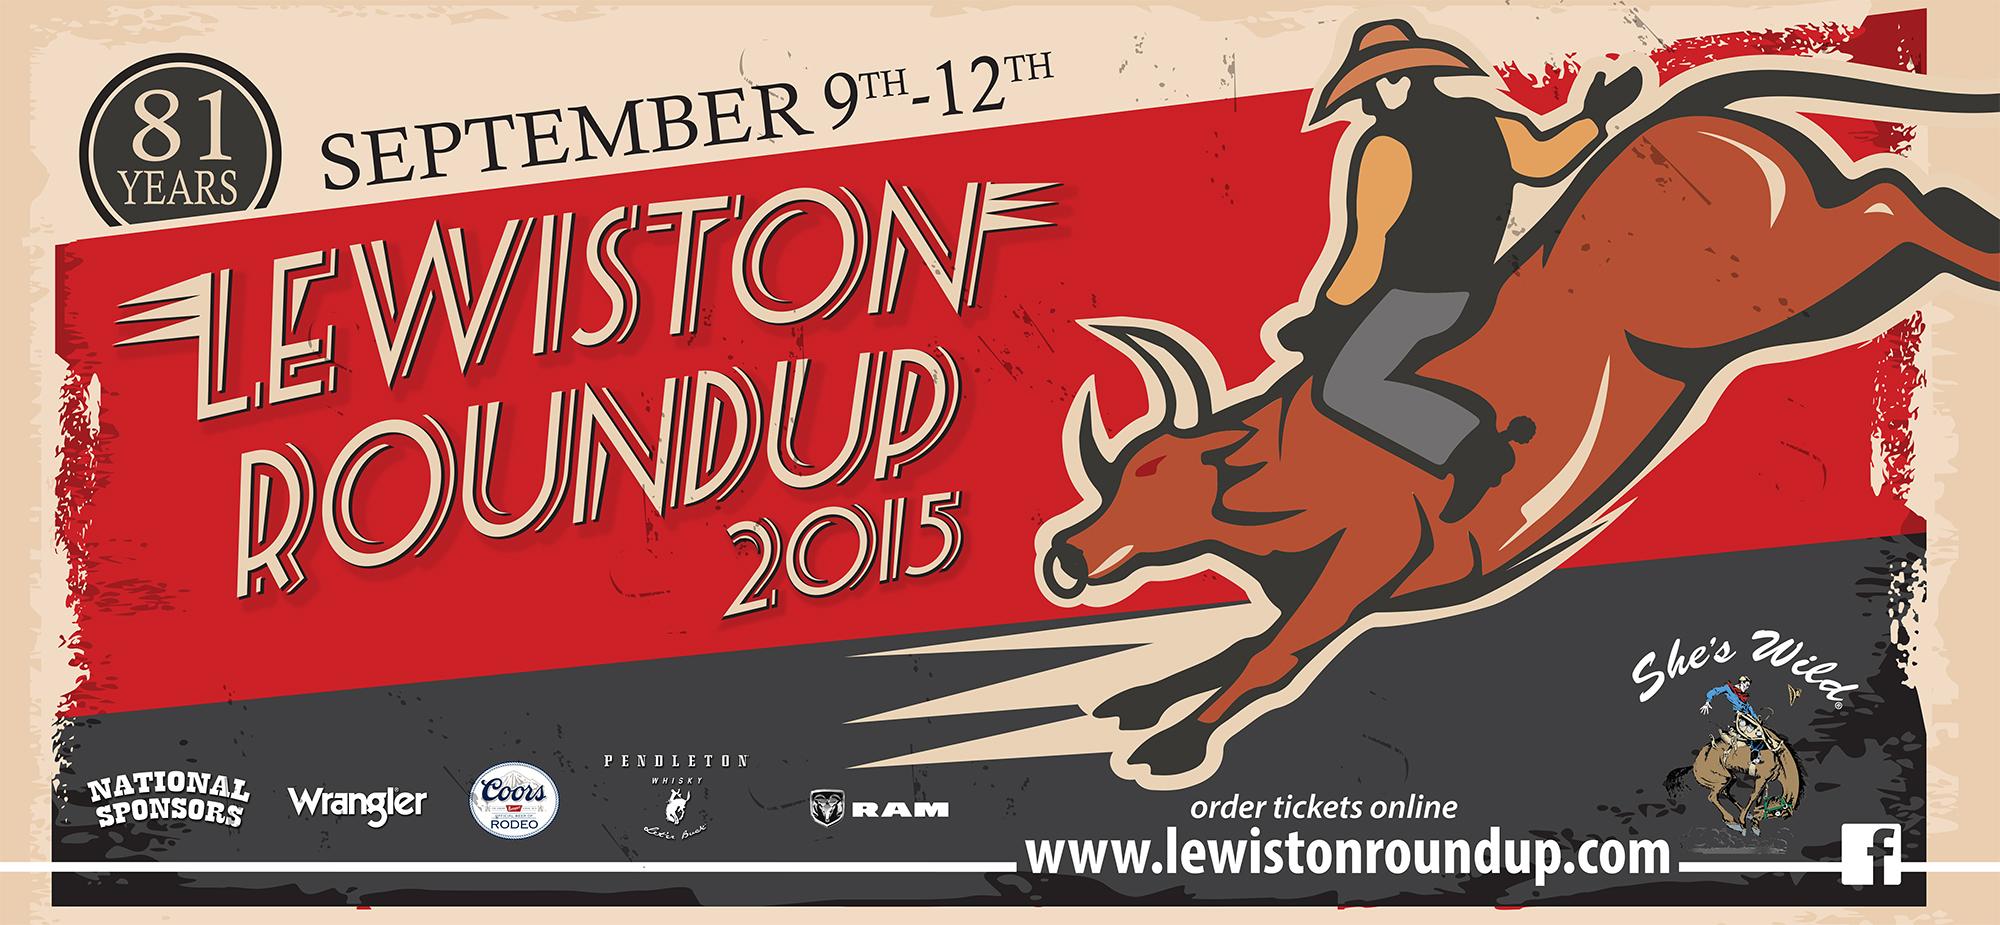 LewistonRoundup_billboard2015-Bull.jpg